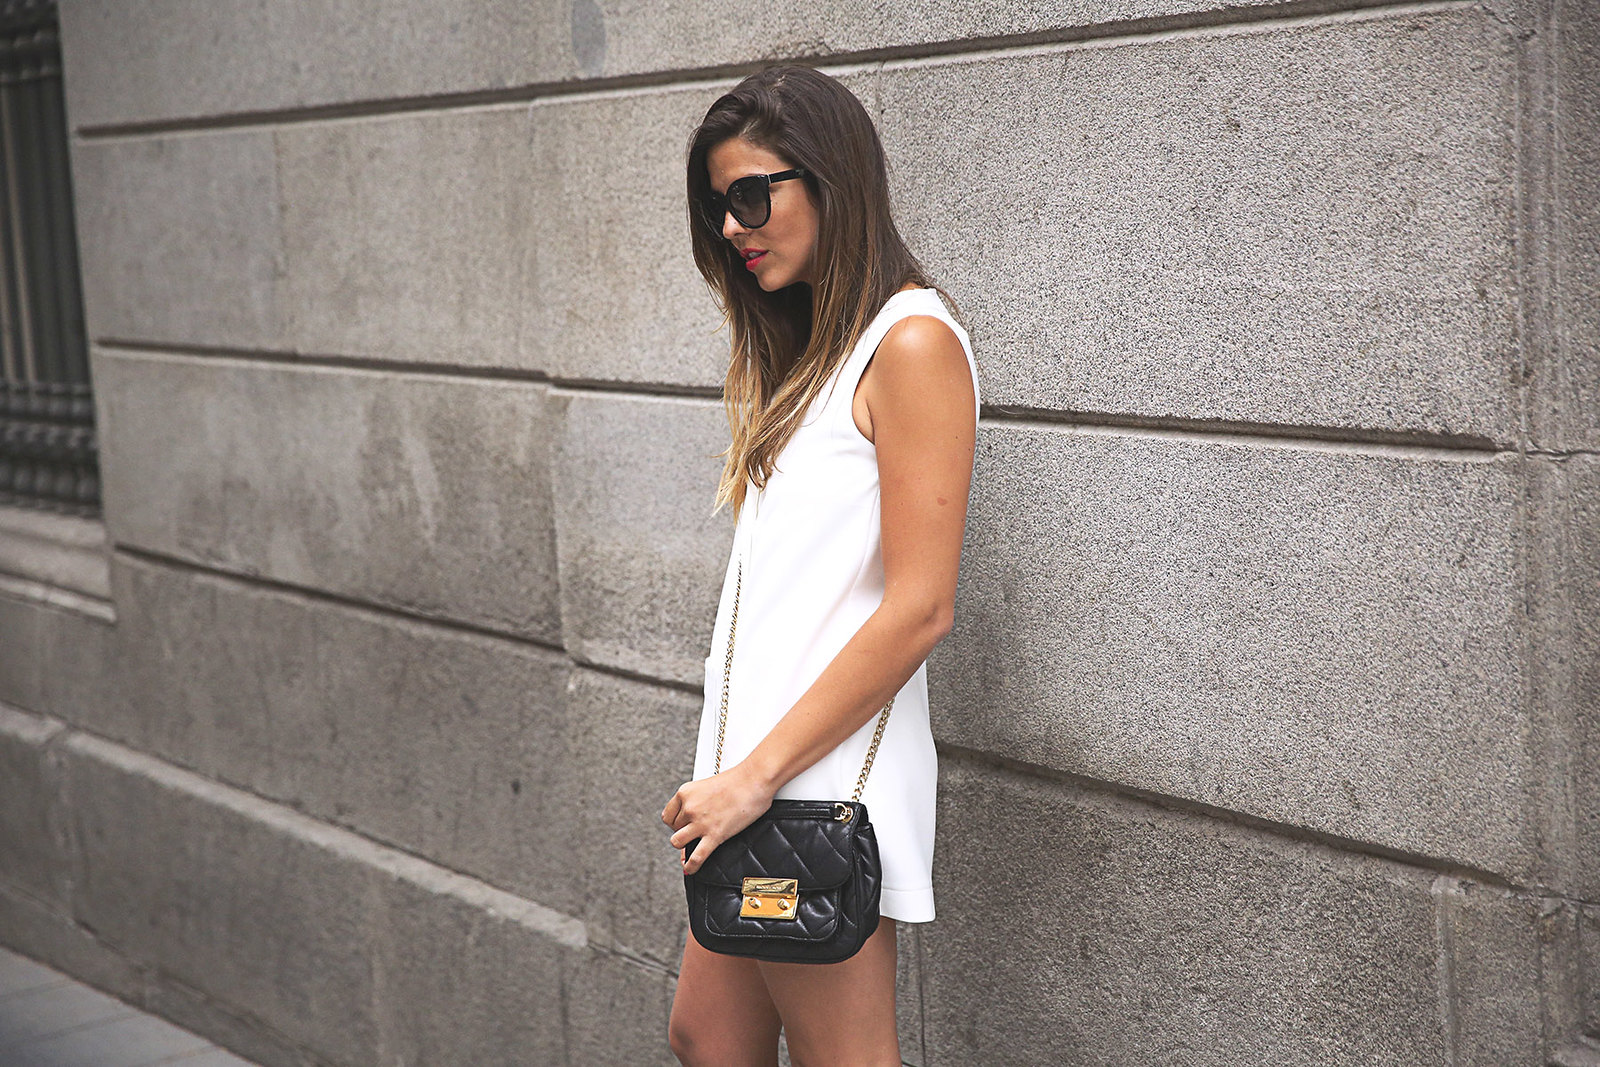 trendy-taste-look-outfit-street-style-ootd-blog-blogger-fashion-spain-moda-españa-steve-madden-mono-overall-playsuit-sandalias-michael-kors-white-blanco-5